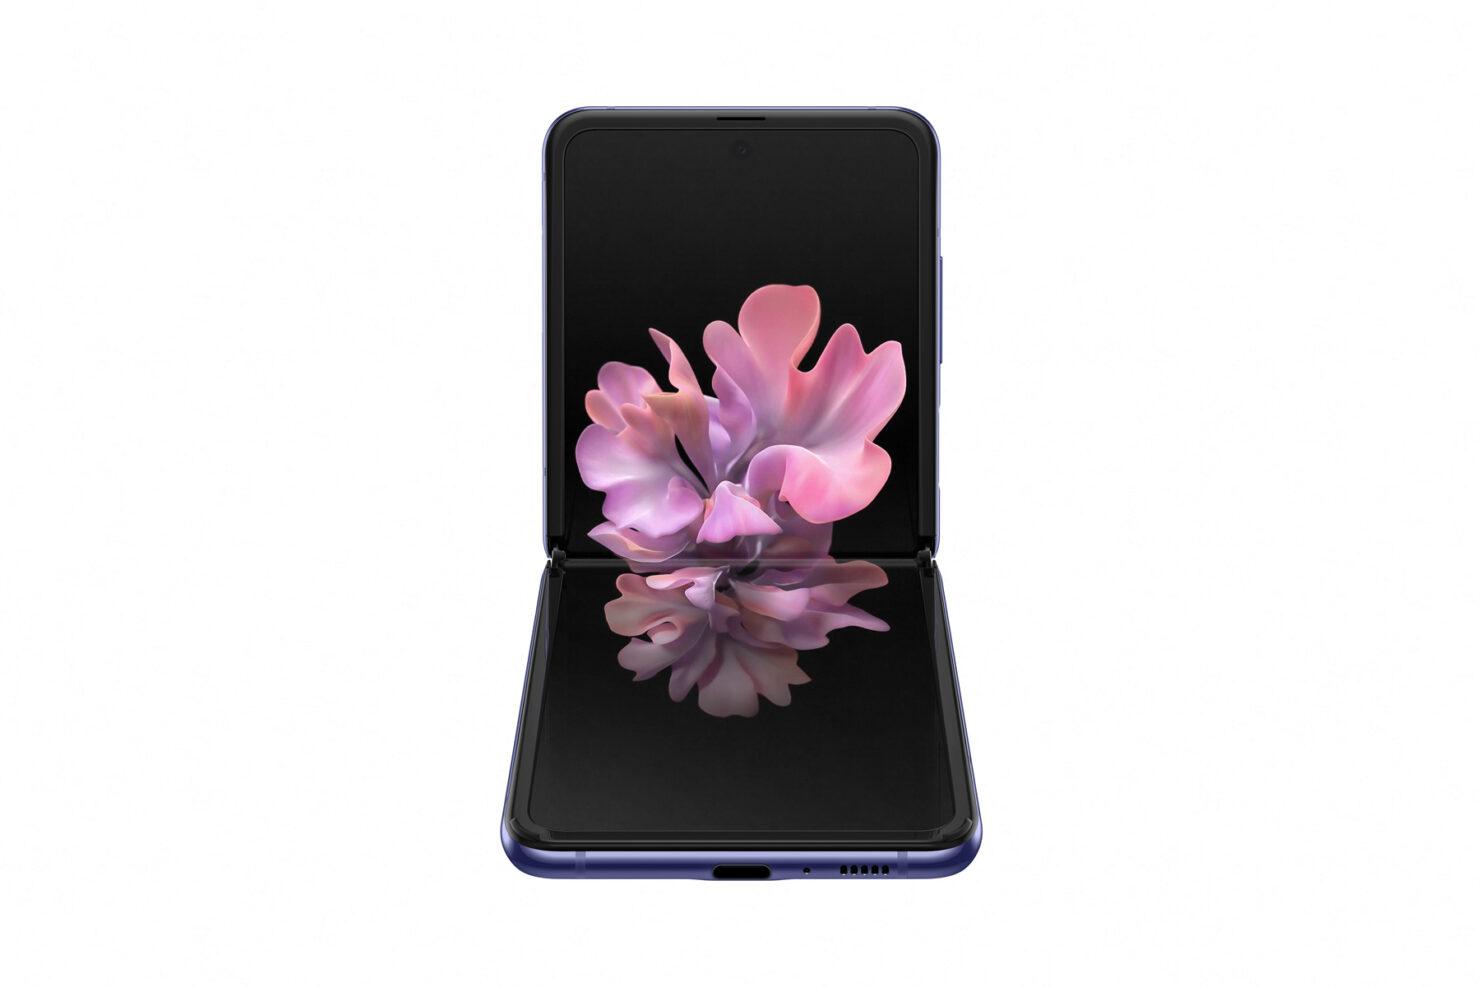 003_galaxyzflip_mirror_purple_front_table_top